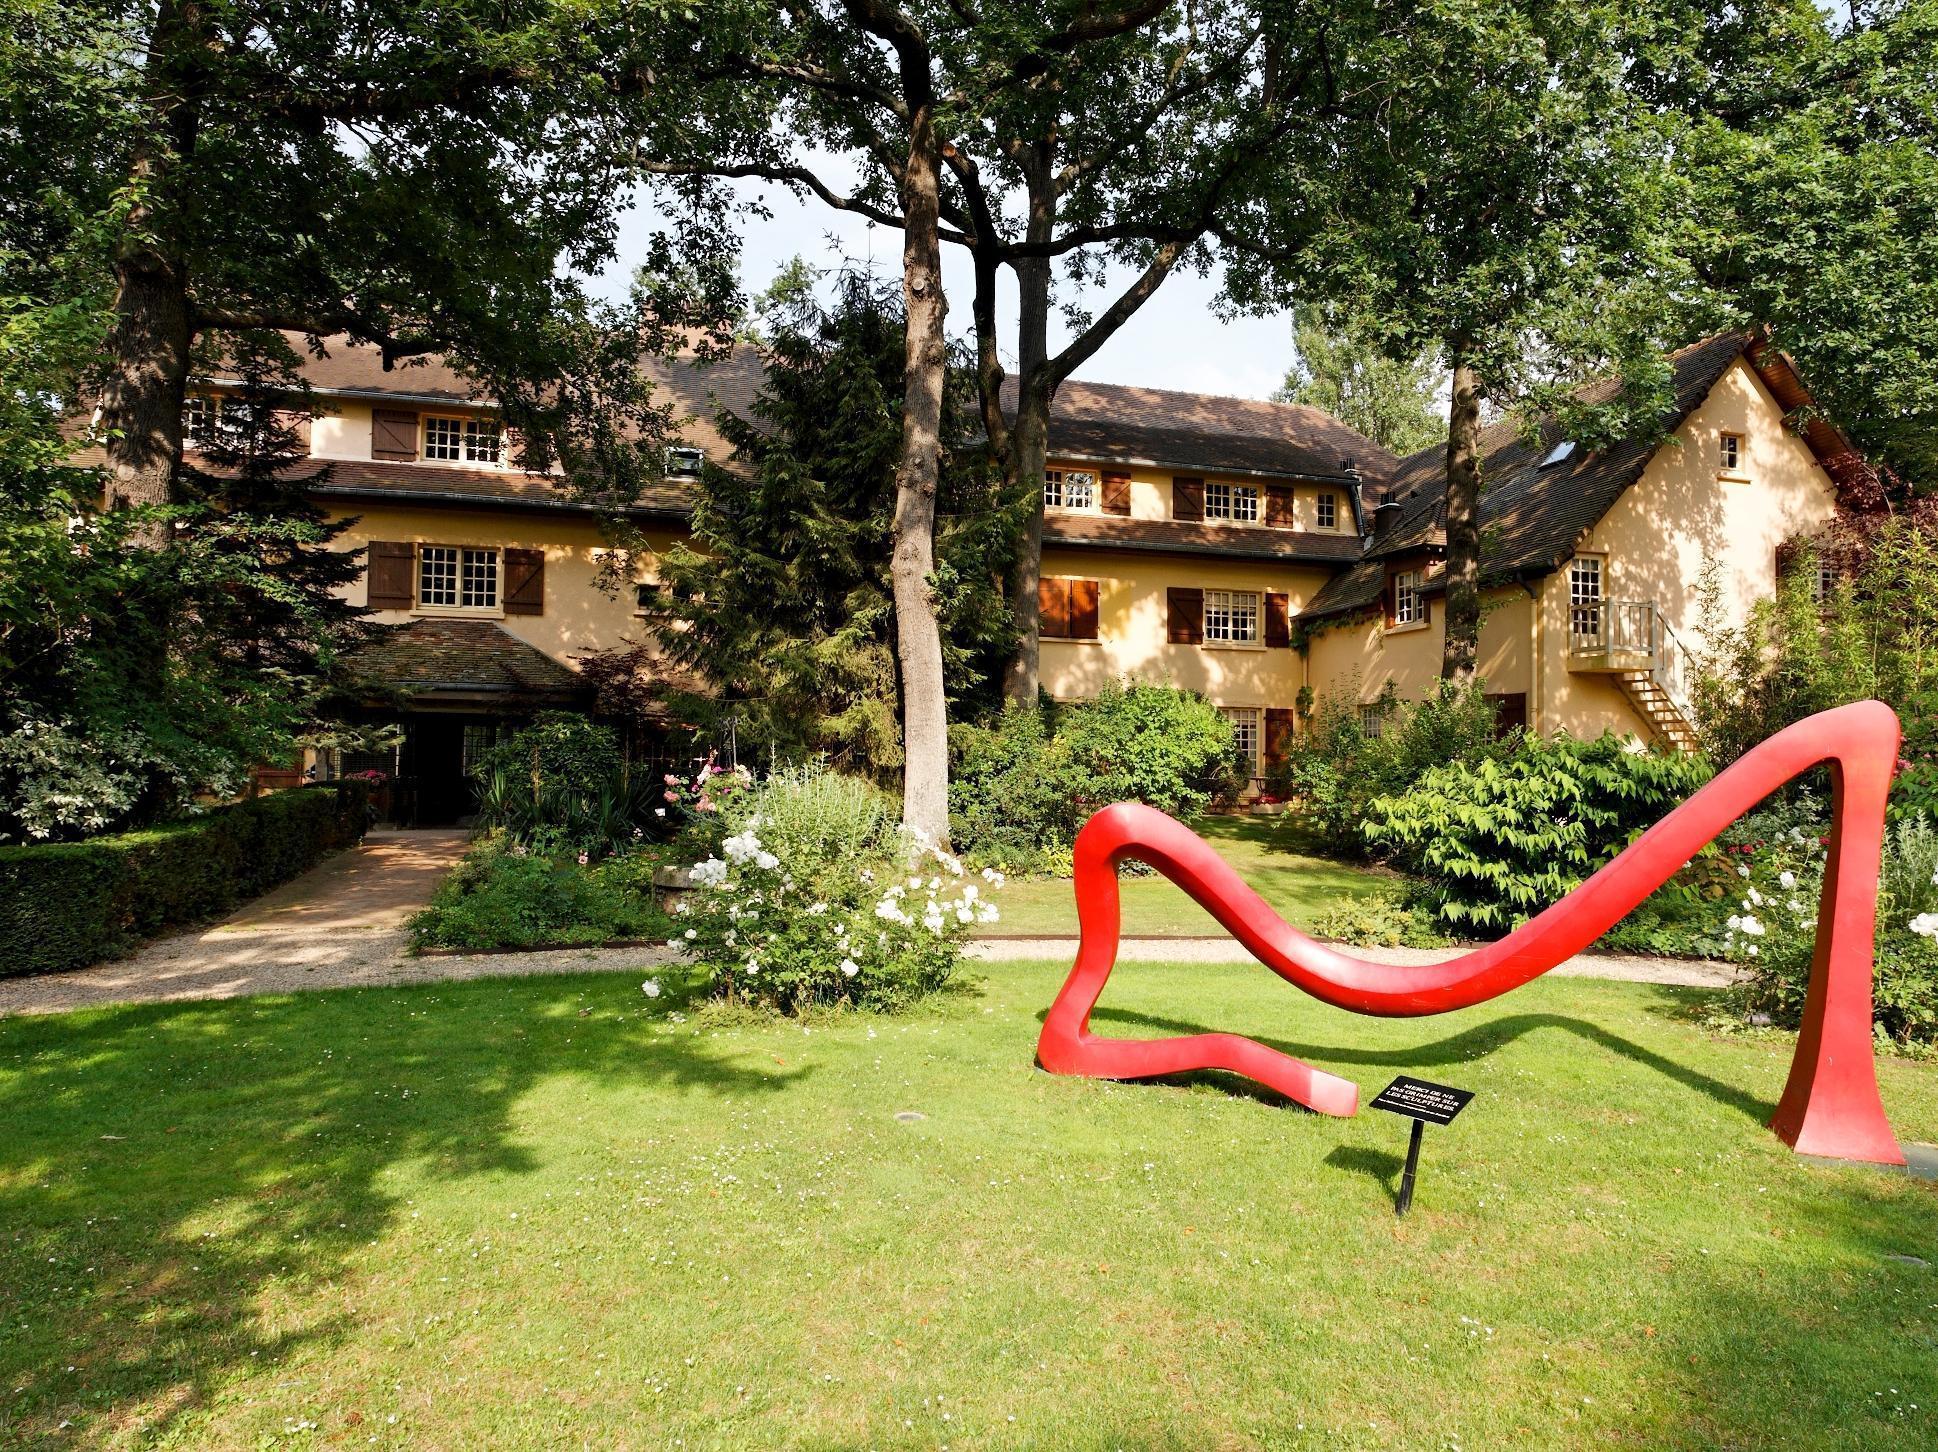 Cazaudehore La Forestiere Hotel, Yvelines